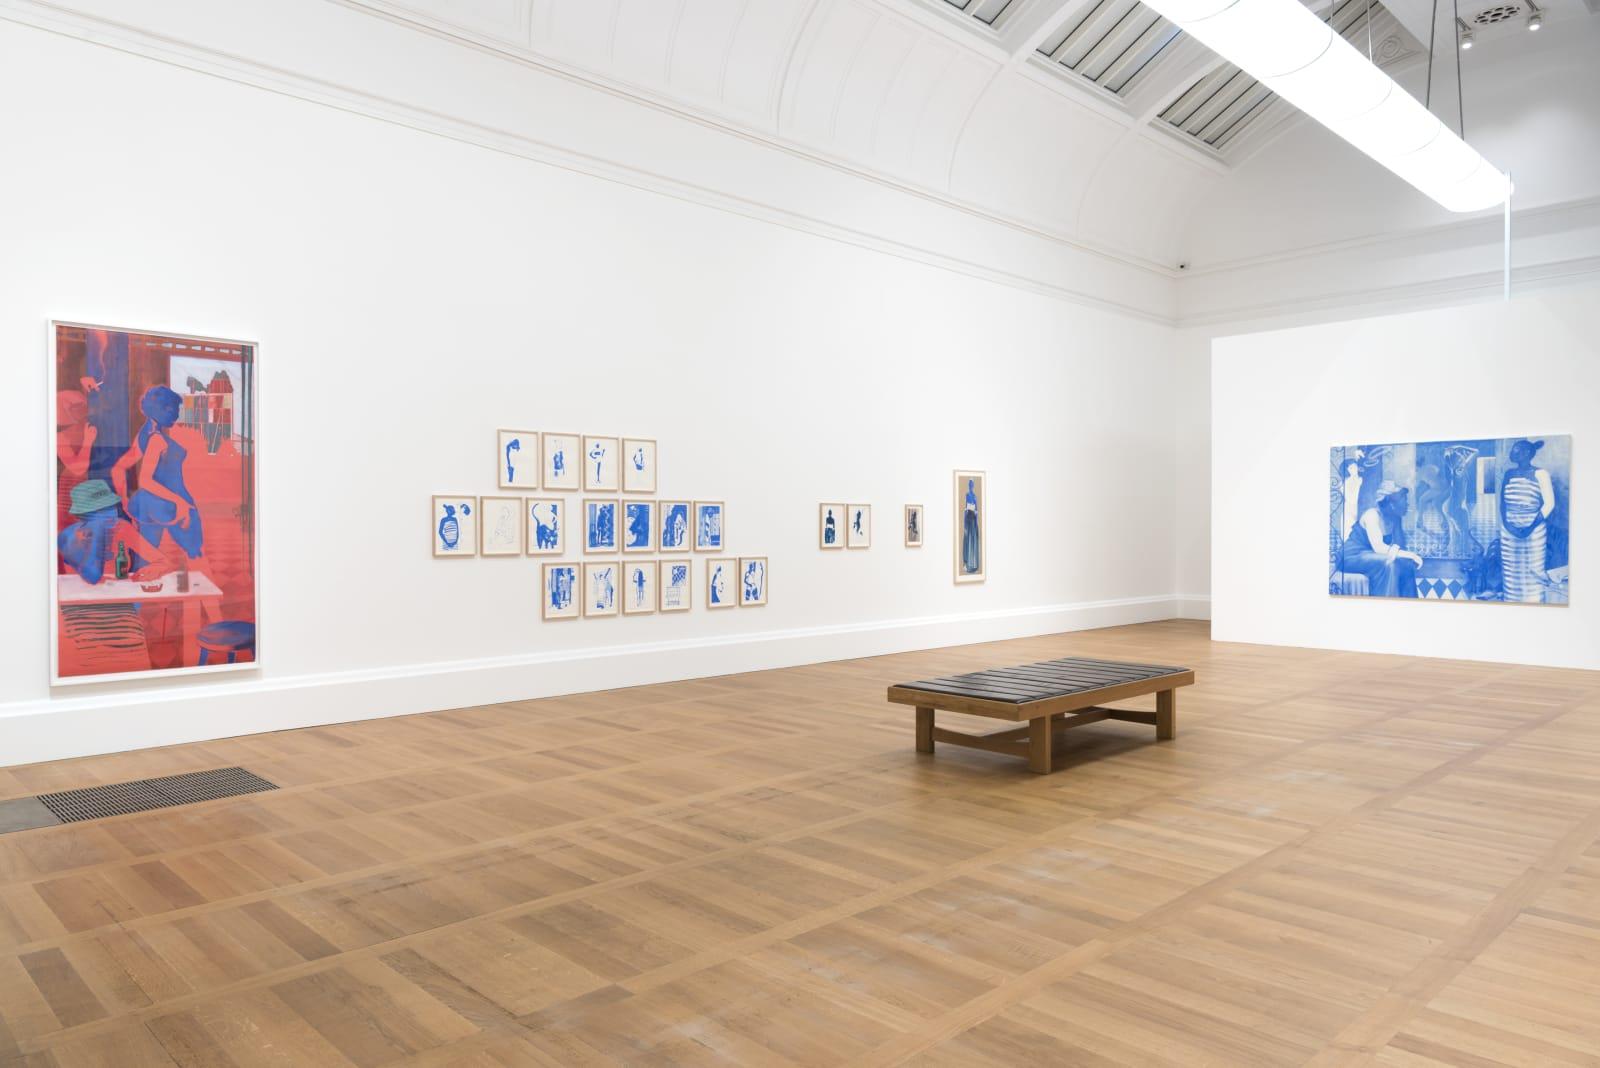 <p>Installation view: 'Art Now: Lisa Brice', Tate Britain, London (2018).</p>